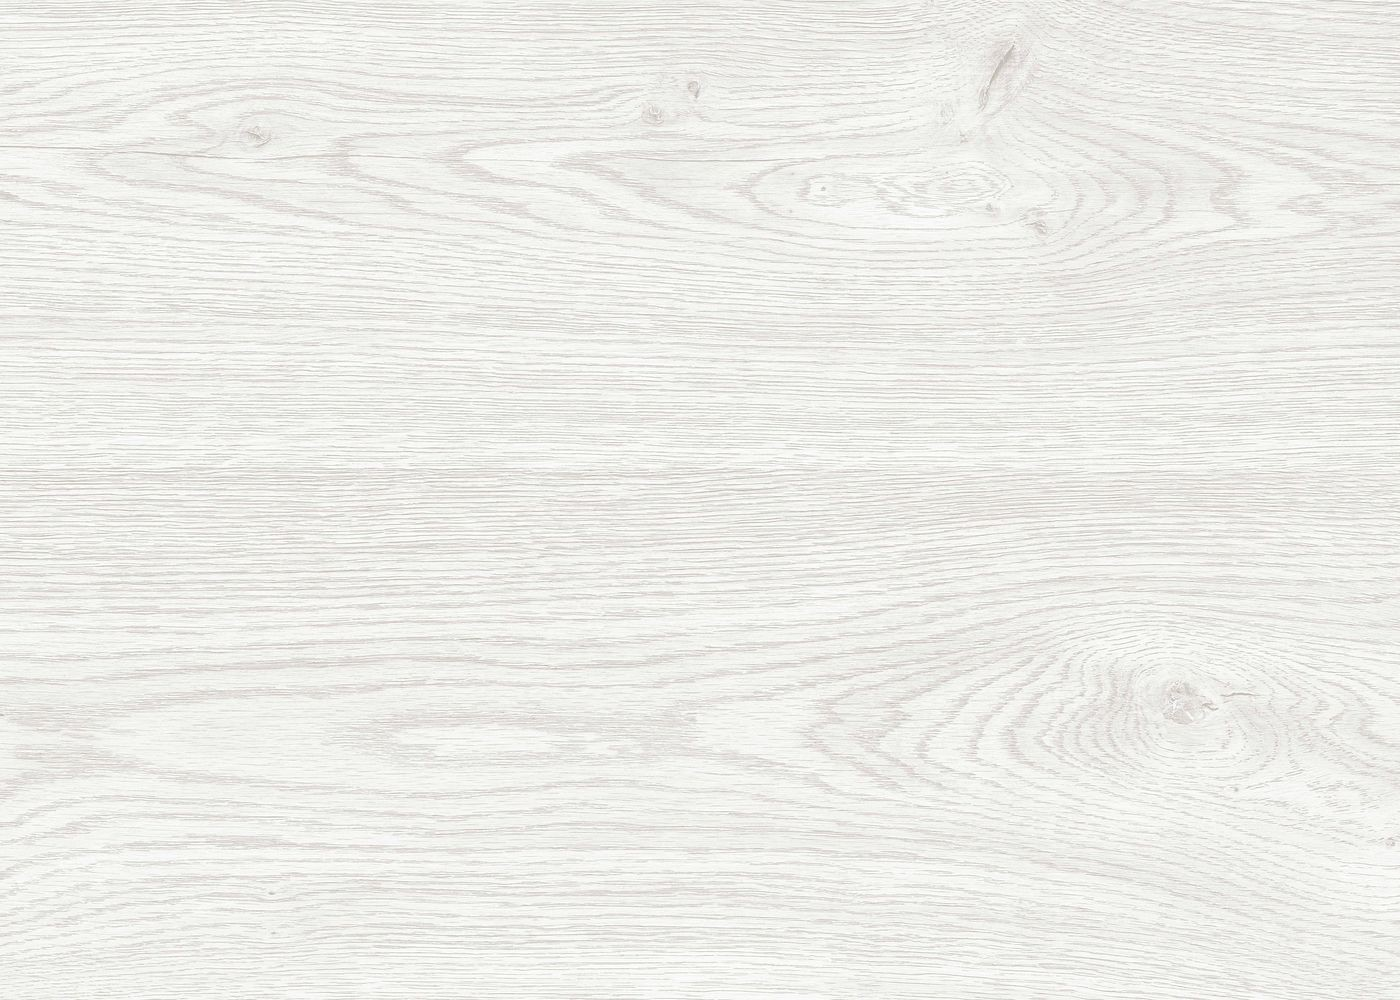 Sol stratifié Chêne Jazz Blanc - Glorious XL 9 G4 - 9x241x2038